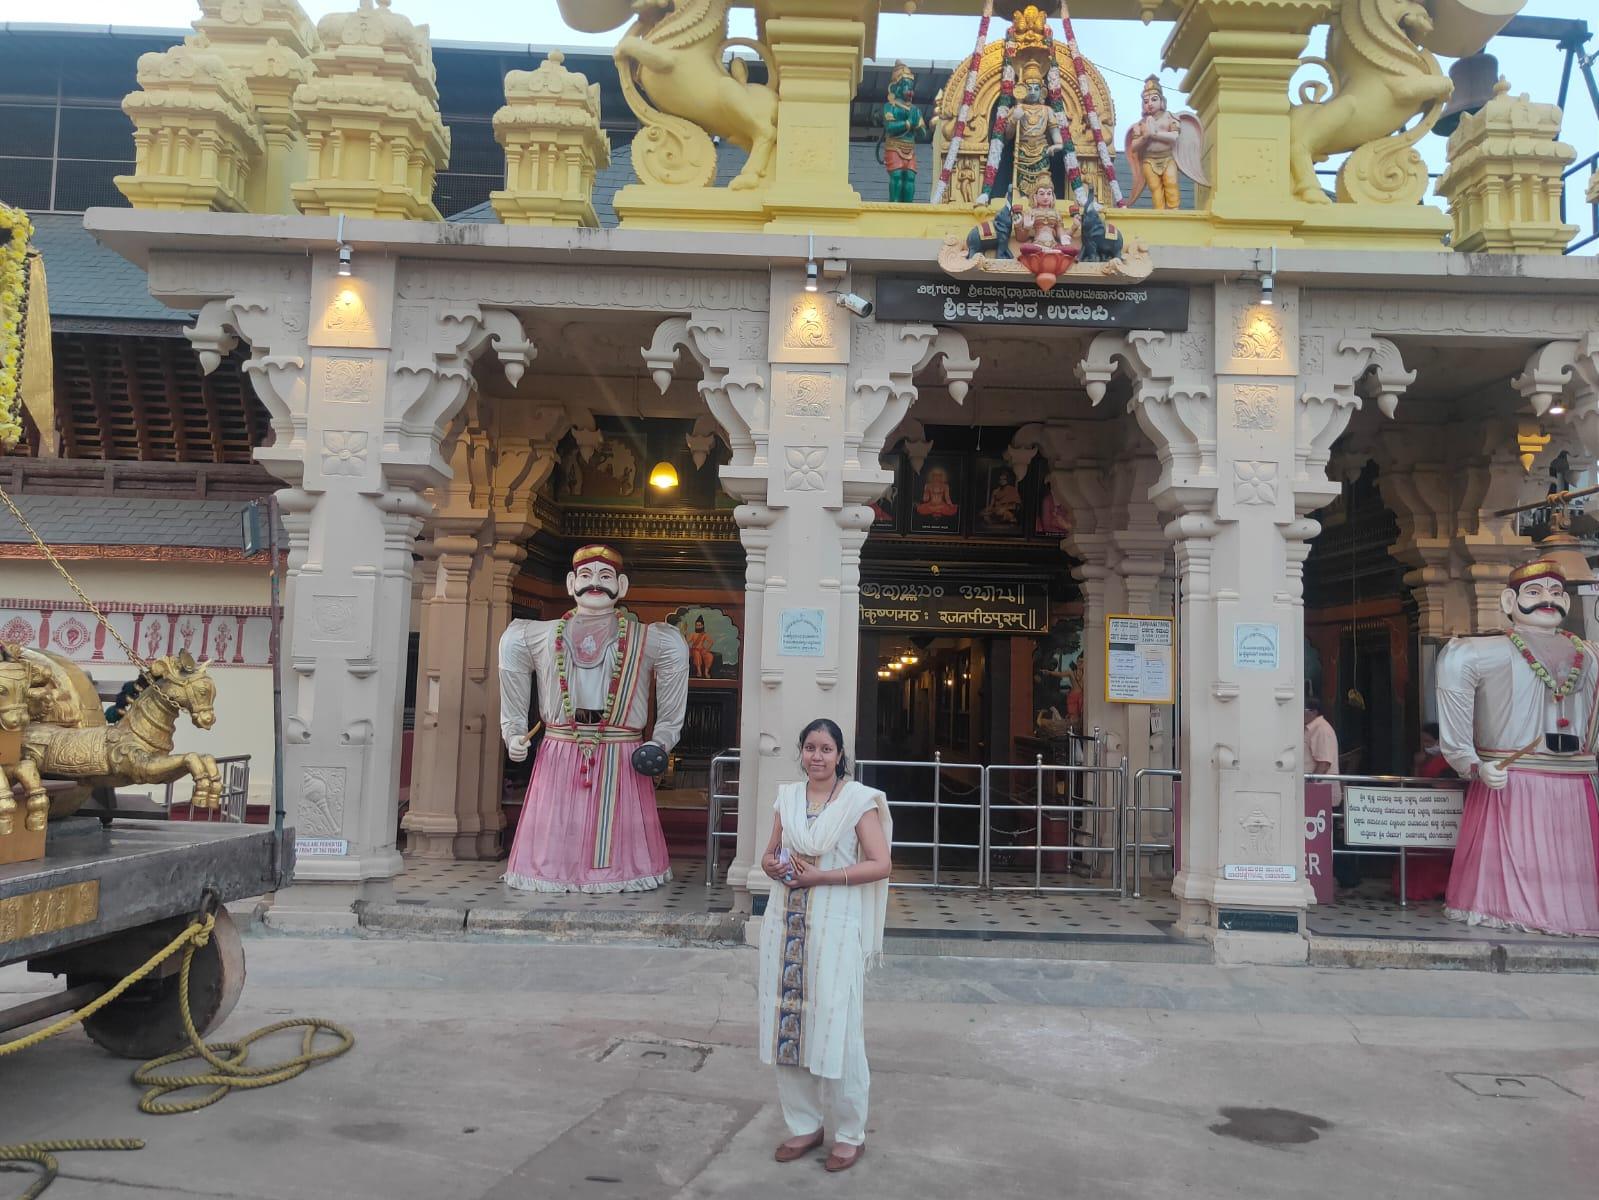 at the Entrance of the Udupi Krishna Temple